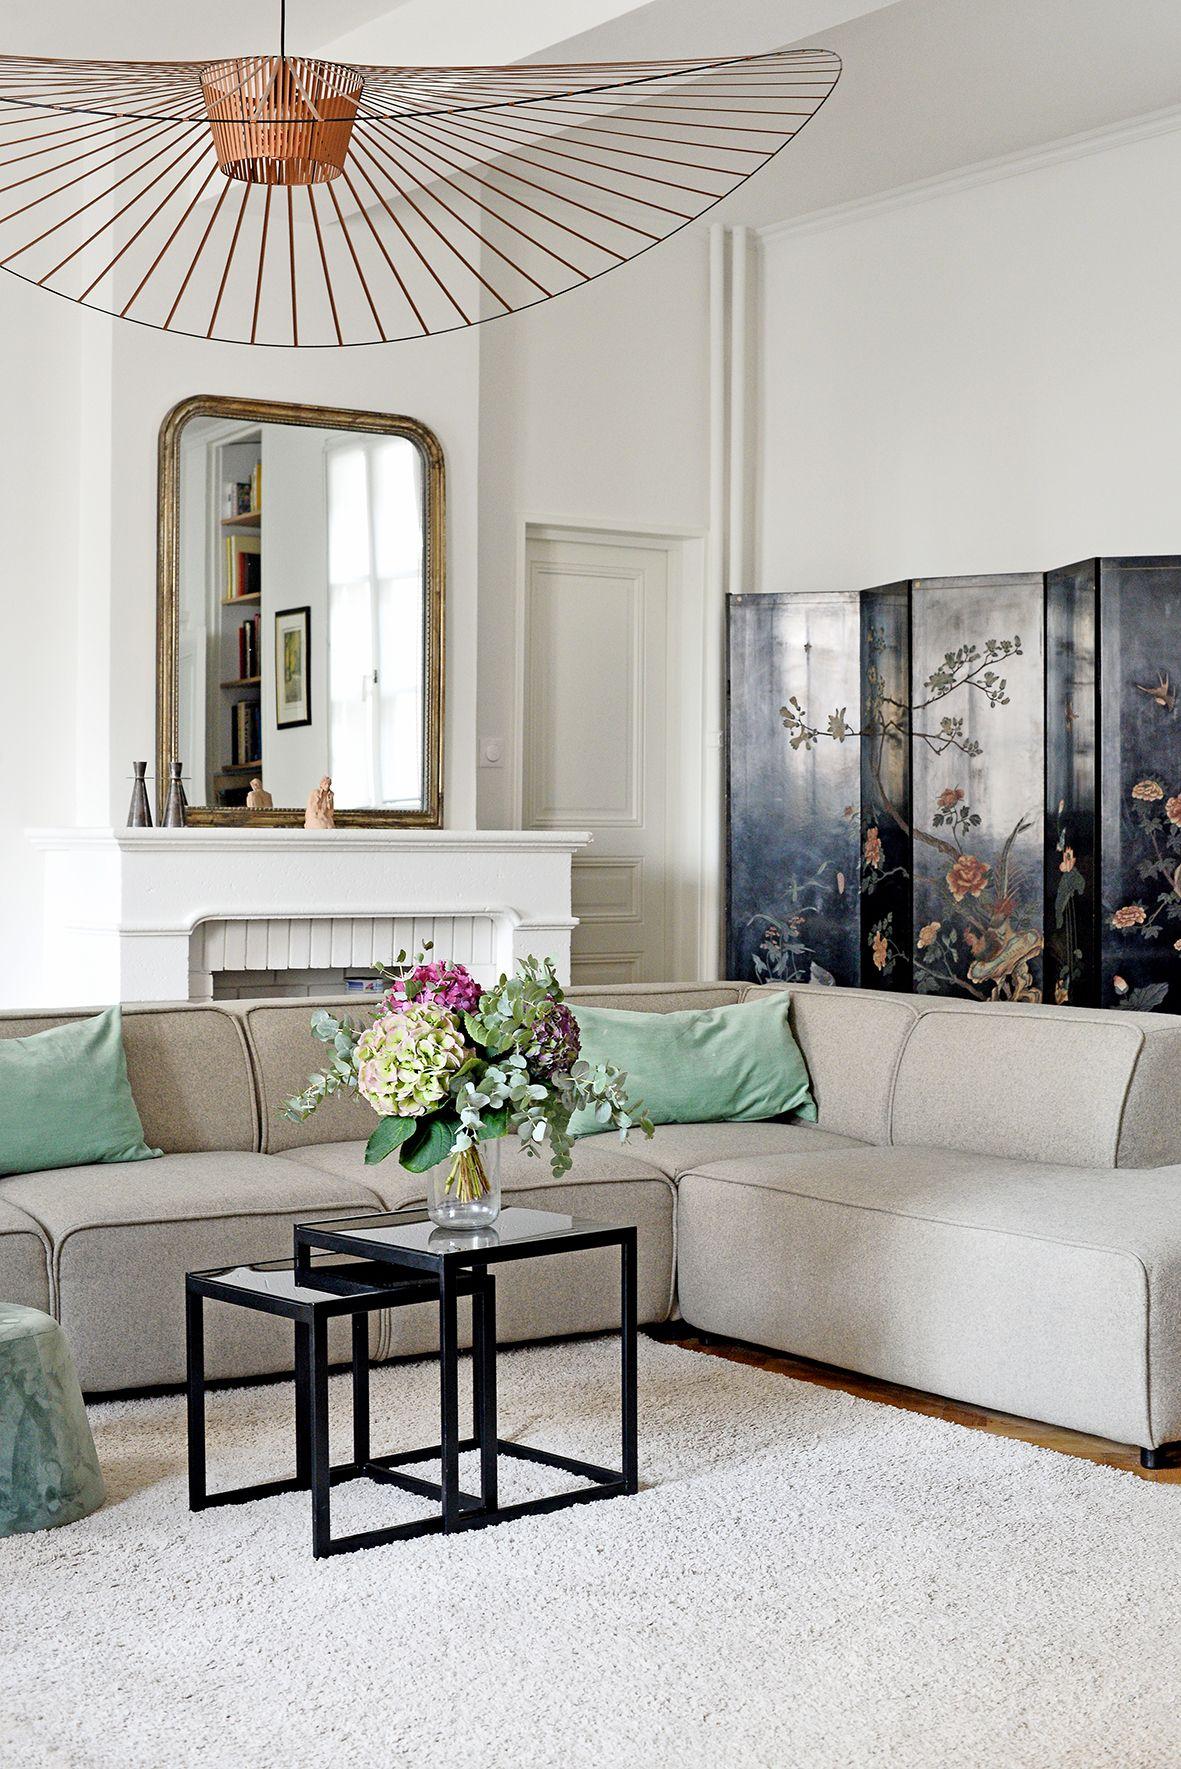 Epingle Par Kristina Shomova Sur Living Room En 2020